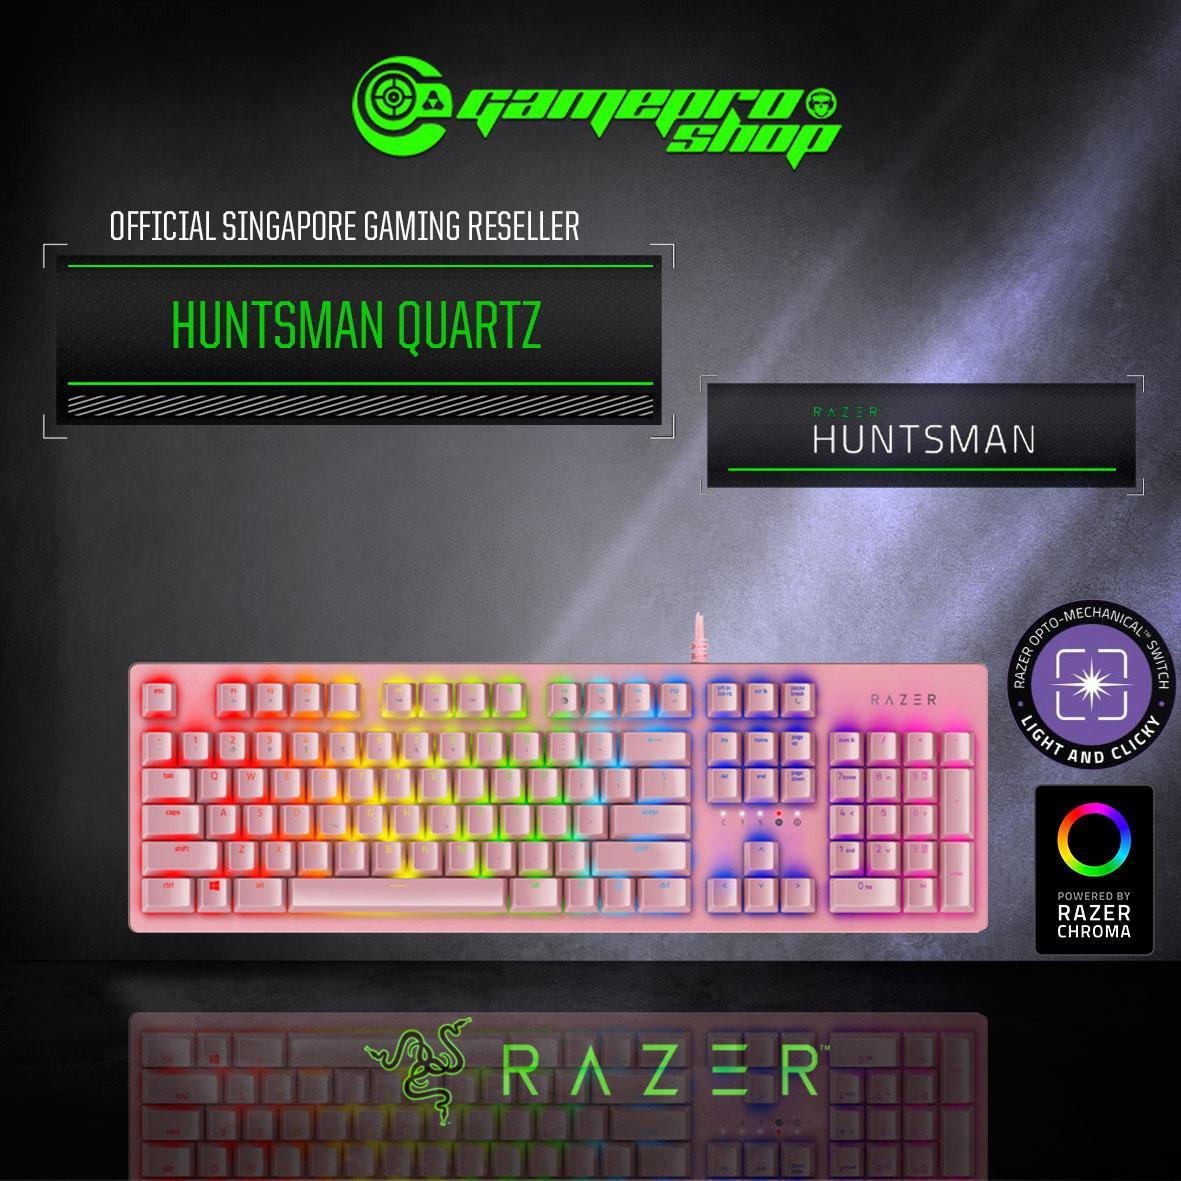 Razer Huntsman OPTO - Mechanical Gaming Keyboard (Black / Quartz / Mercury White) Singapore